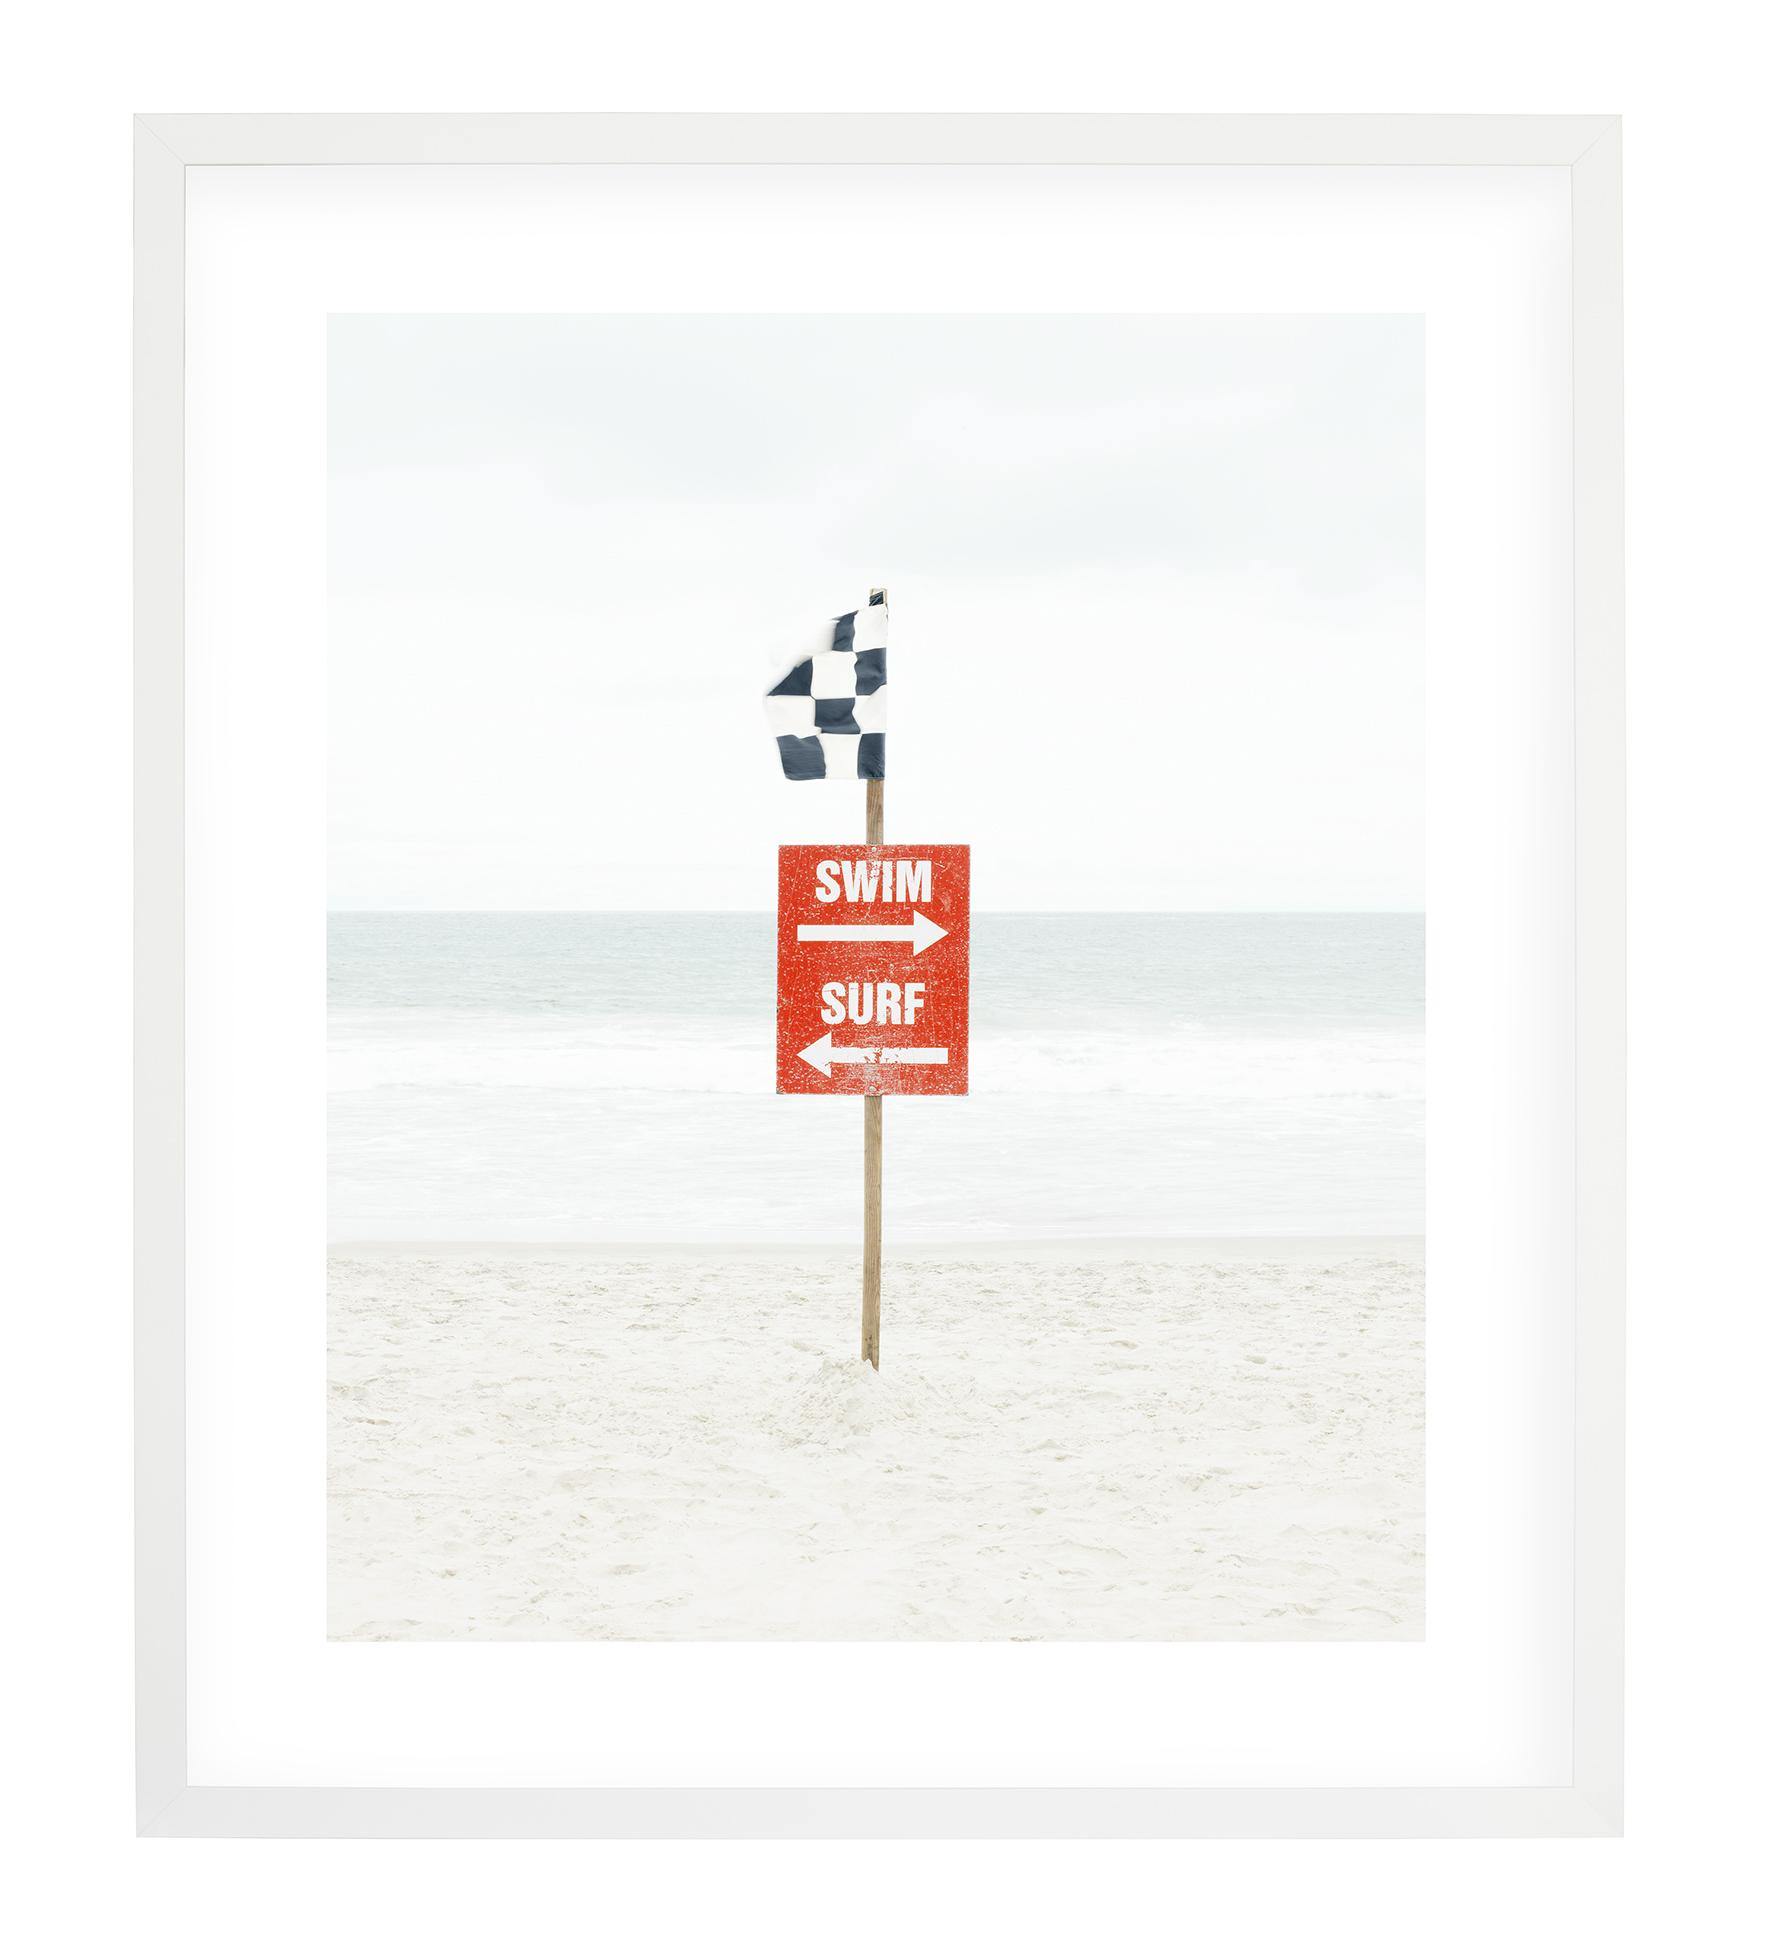 JP GREENWOOD_SWIM SURF FRONT VIEW.jpg